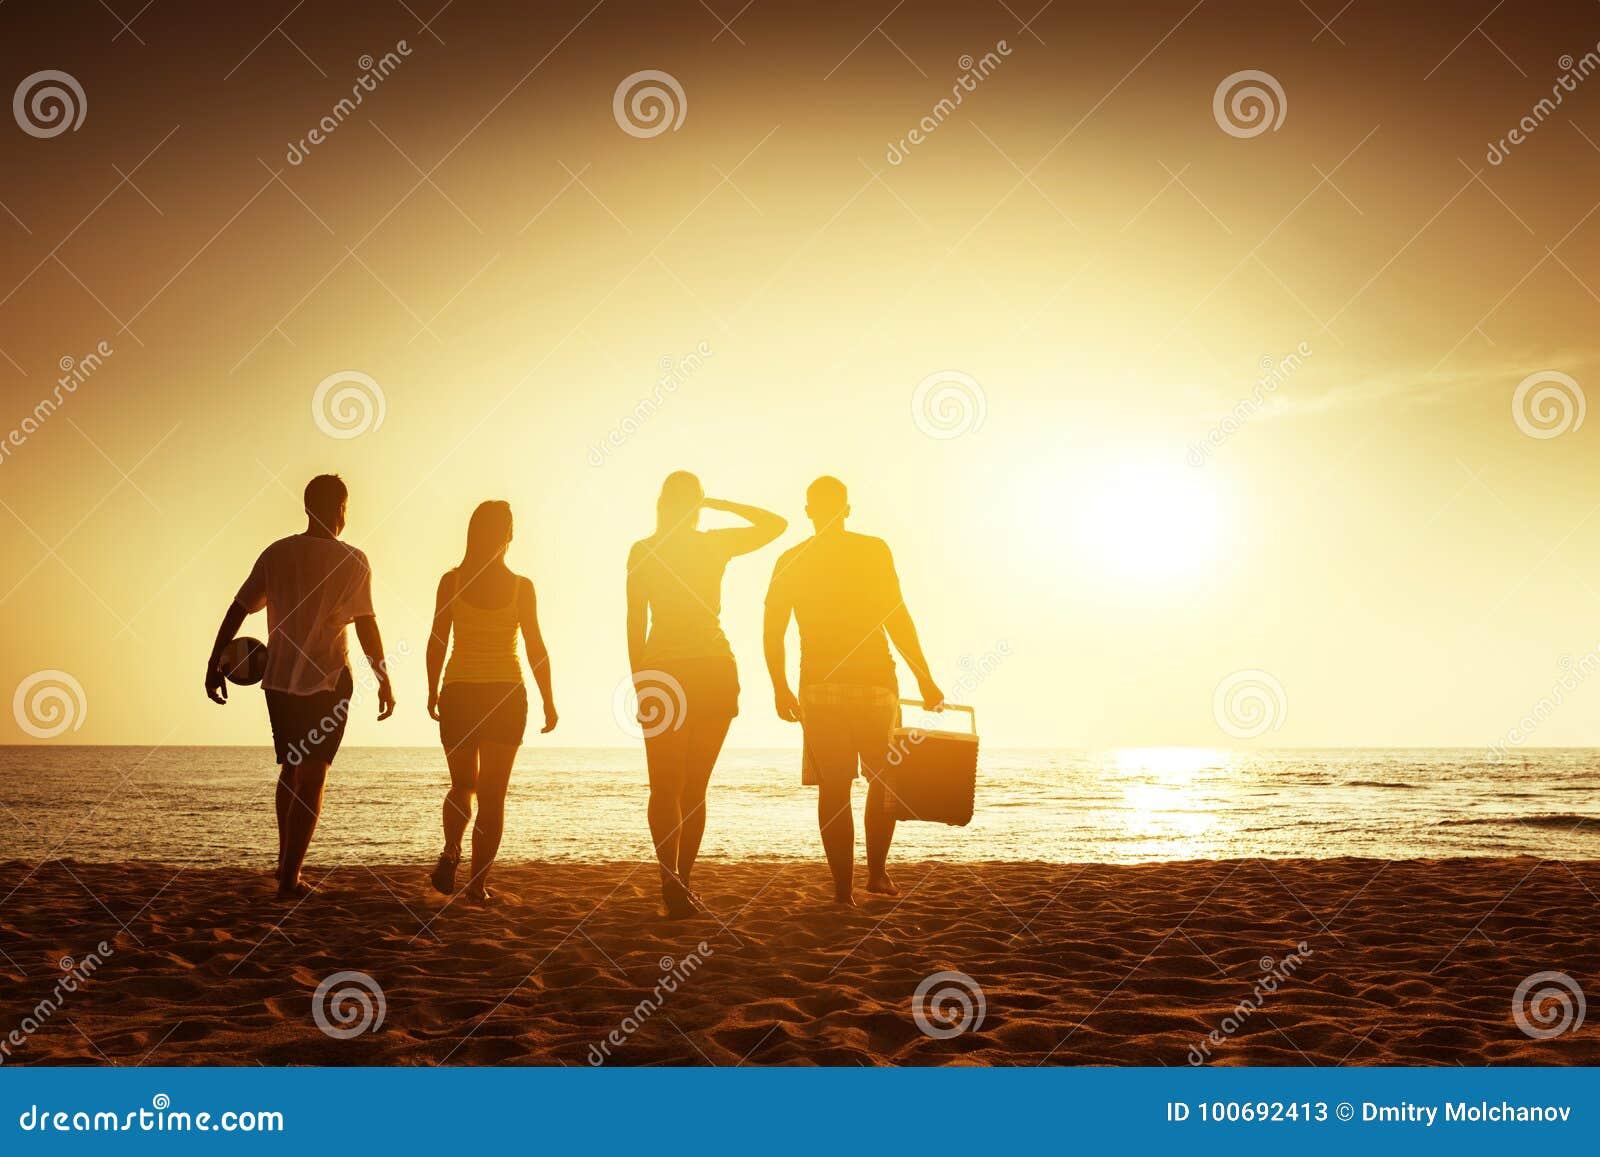 Friends beach sunset concept with stuff